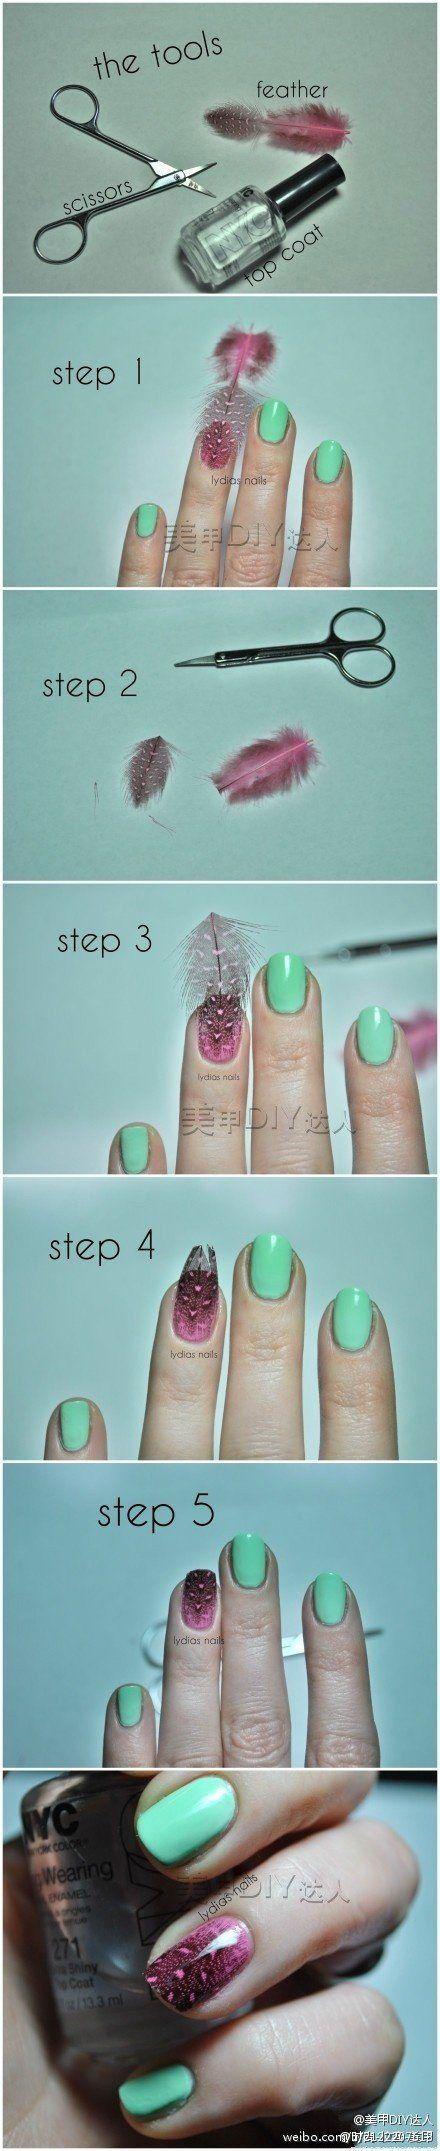 Diseños de uñas faciles paso a paso